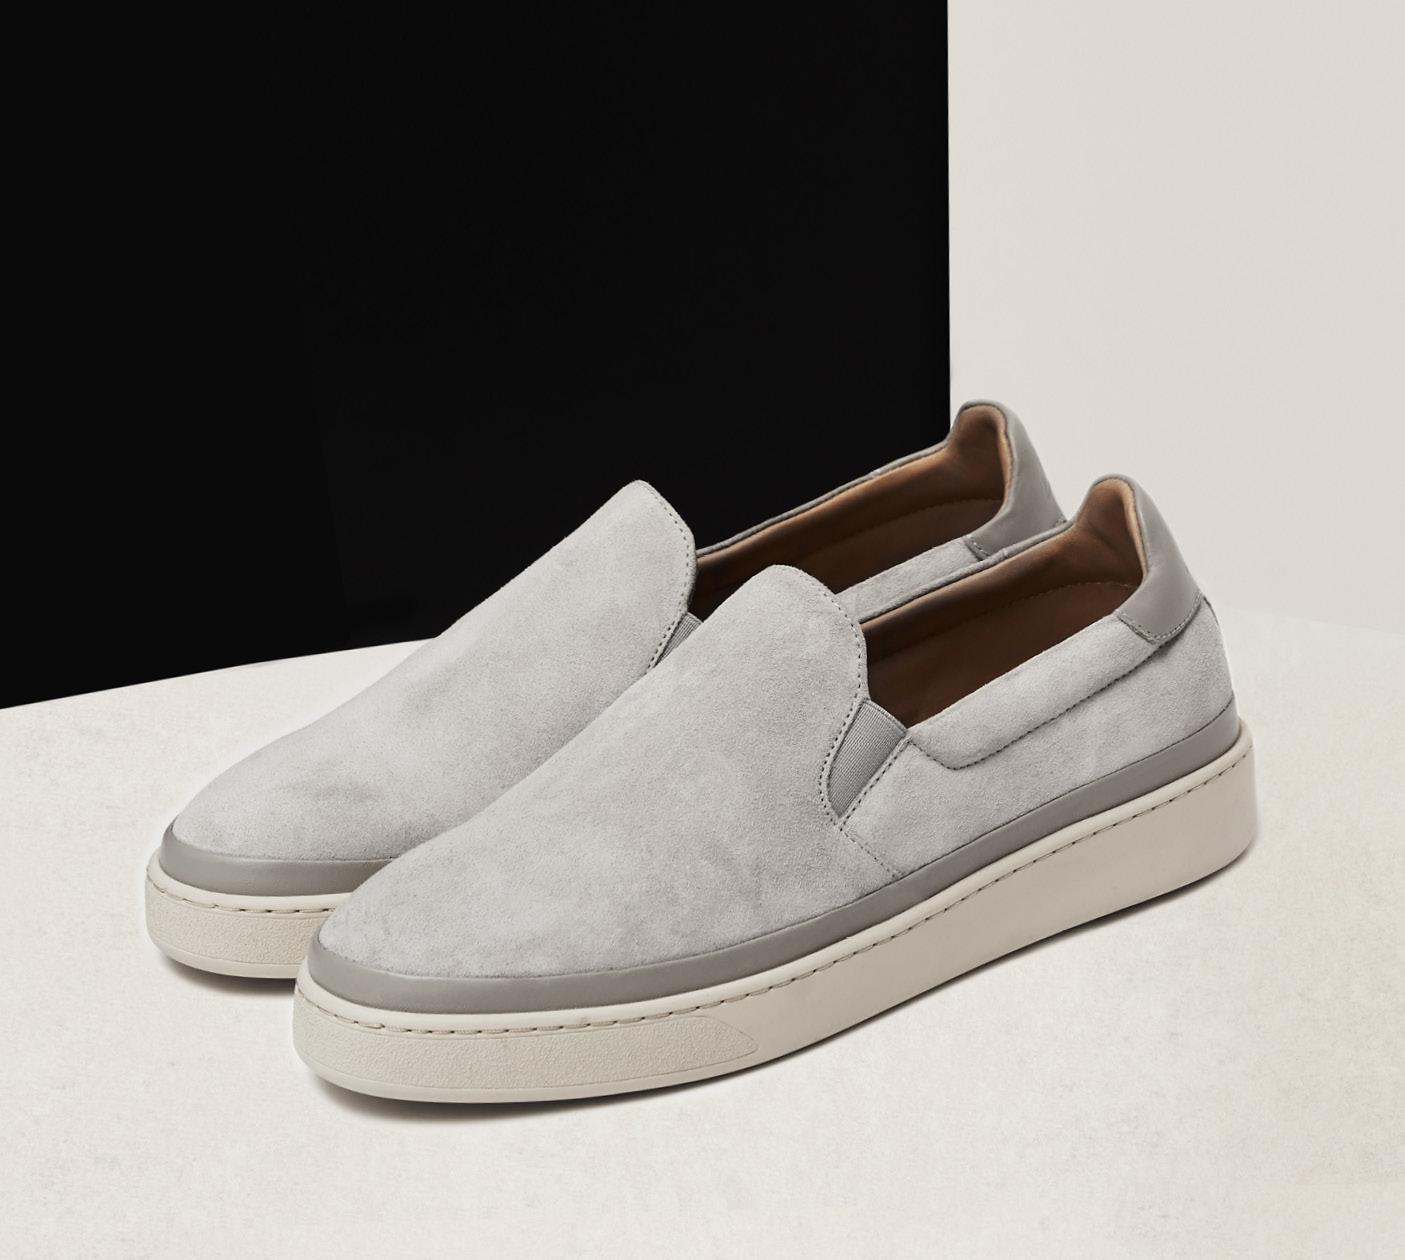 Suede Grey Slip-On Sneakers for Men